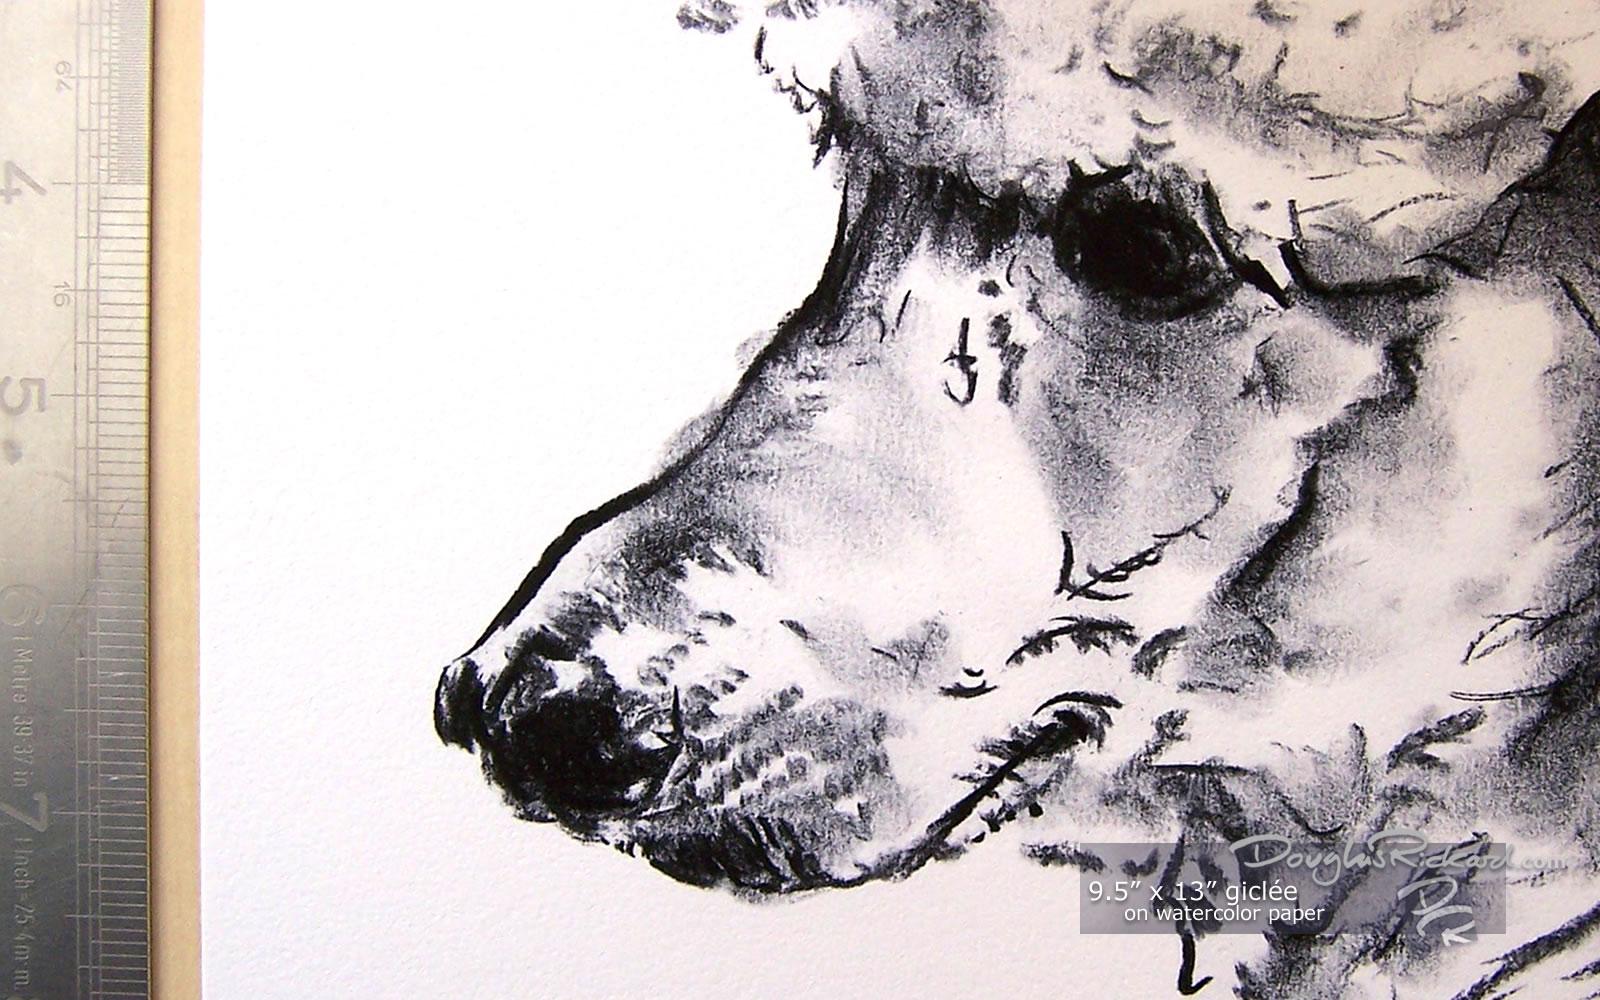 Drawn poodle watercolor Art 5